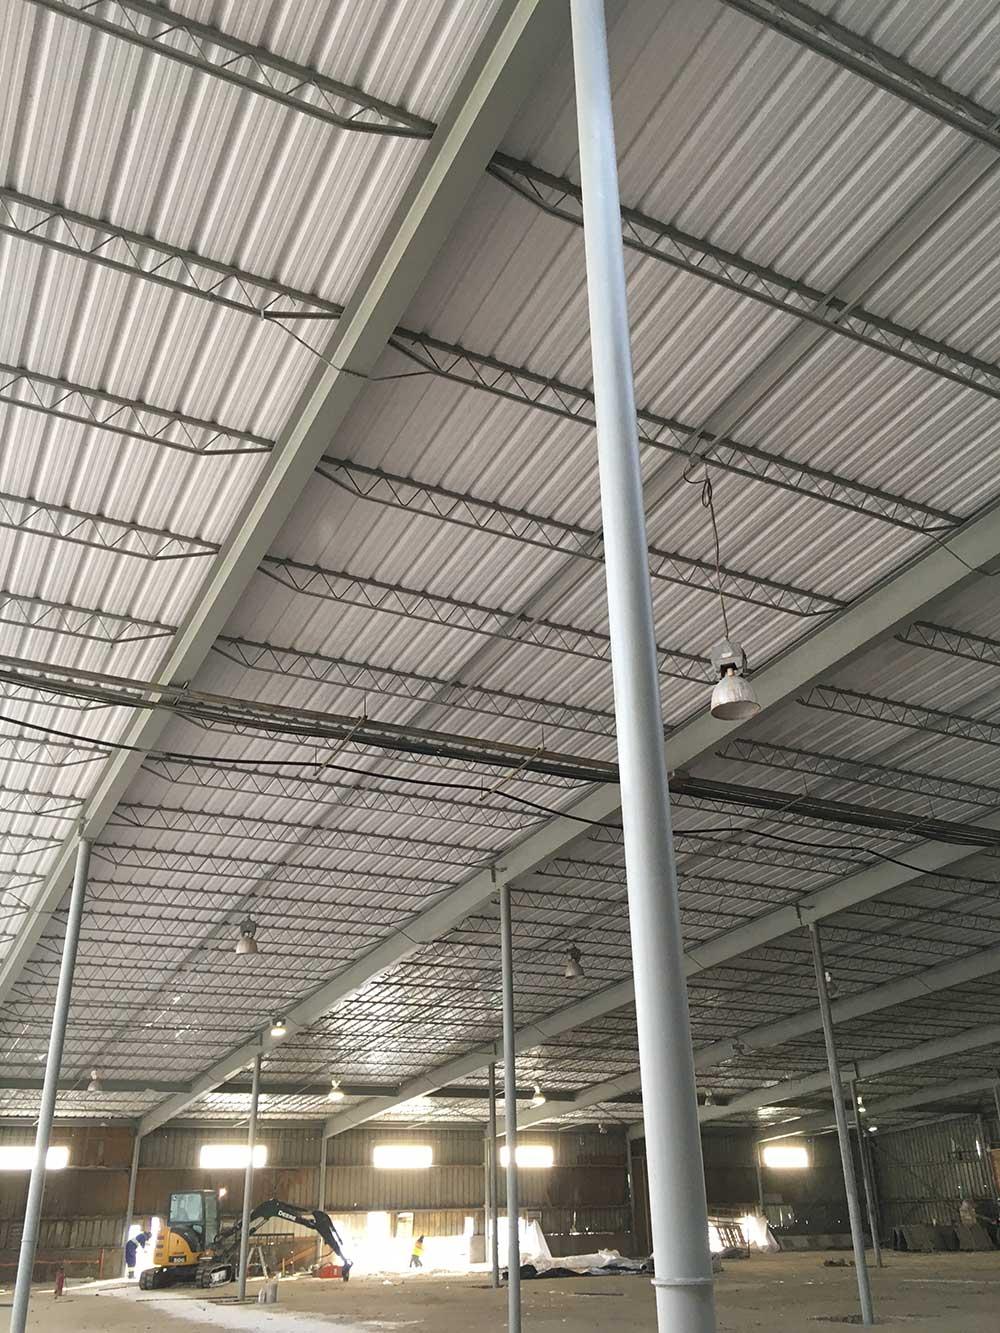 steel-roofing-in-industrial-building-under-construction